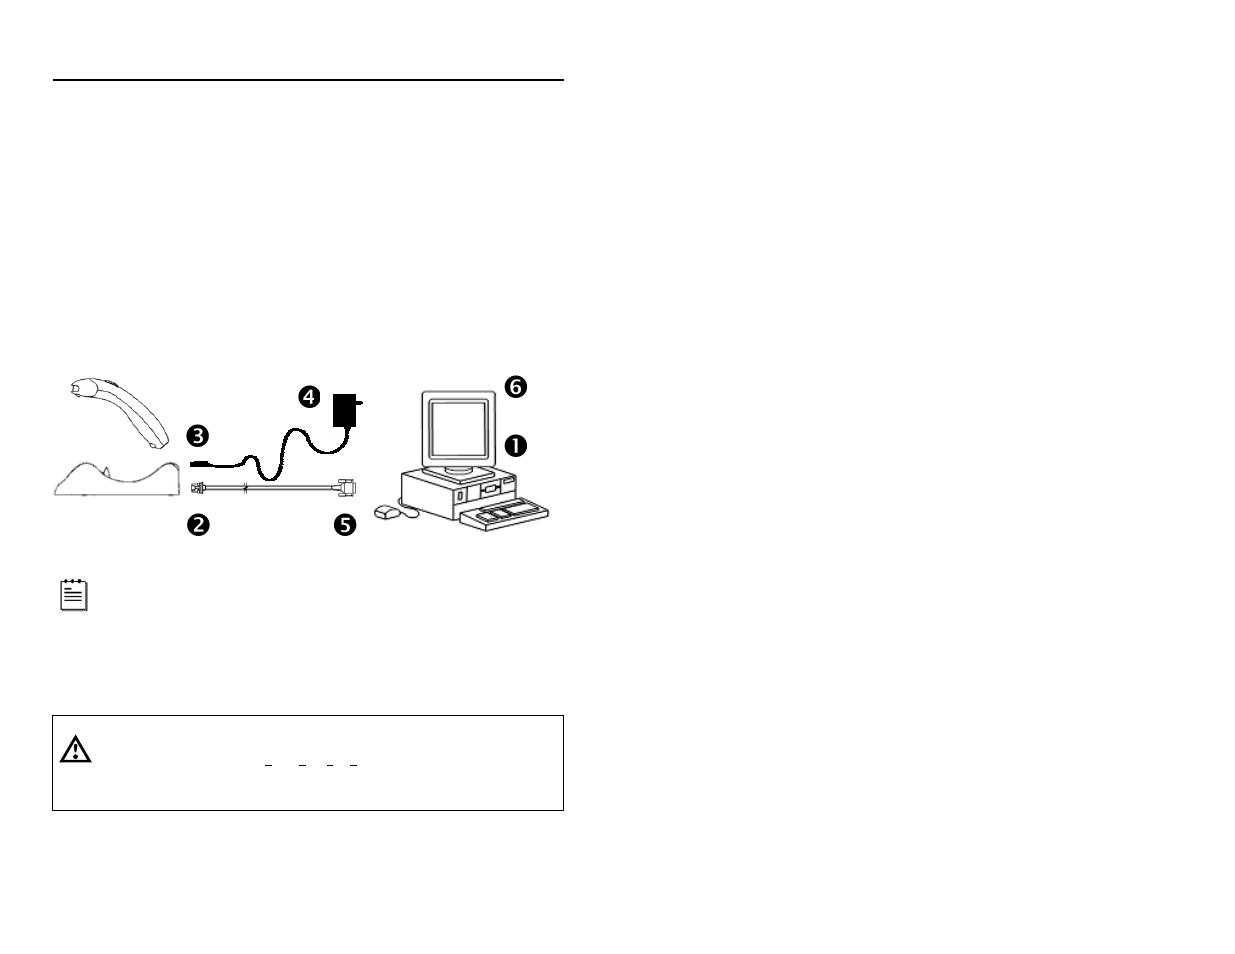 rs232 and light pen scanner installation metrologic instruments rh manualsdir com 856 Area Code Metrologic Instruments Drivers